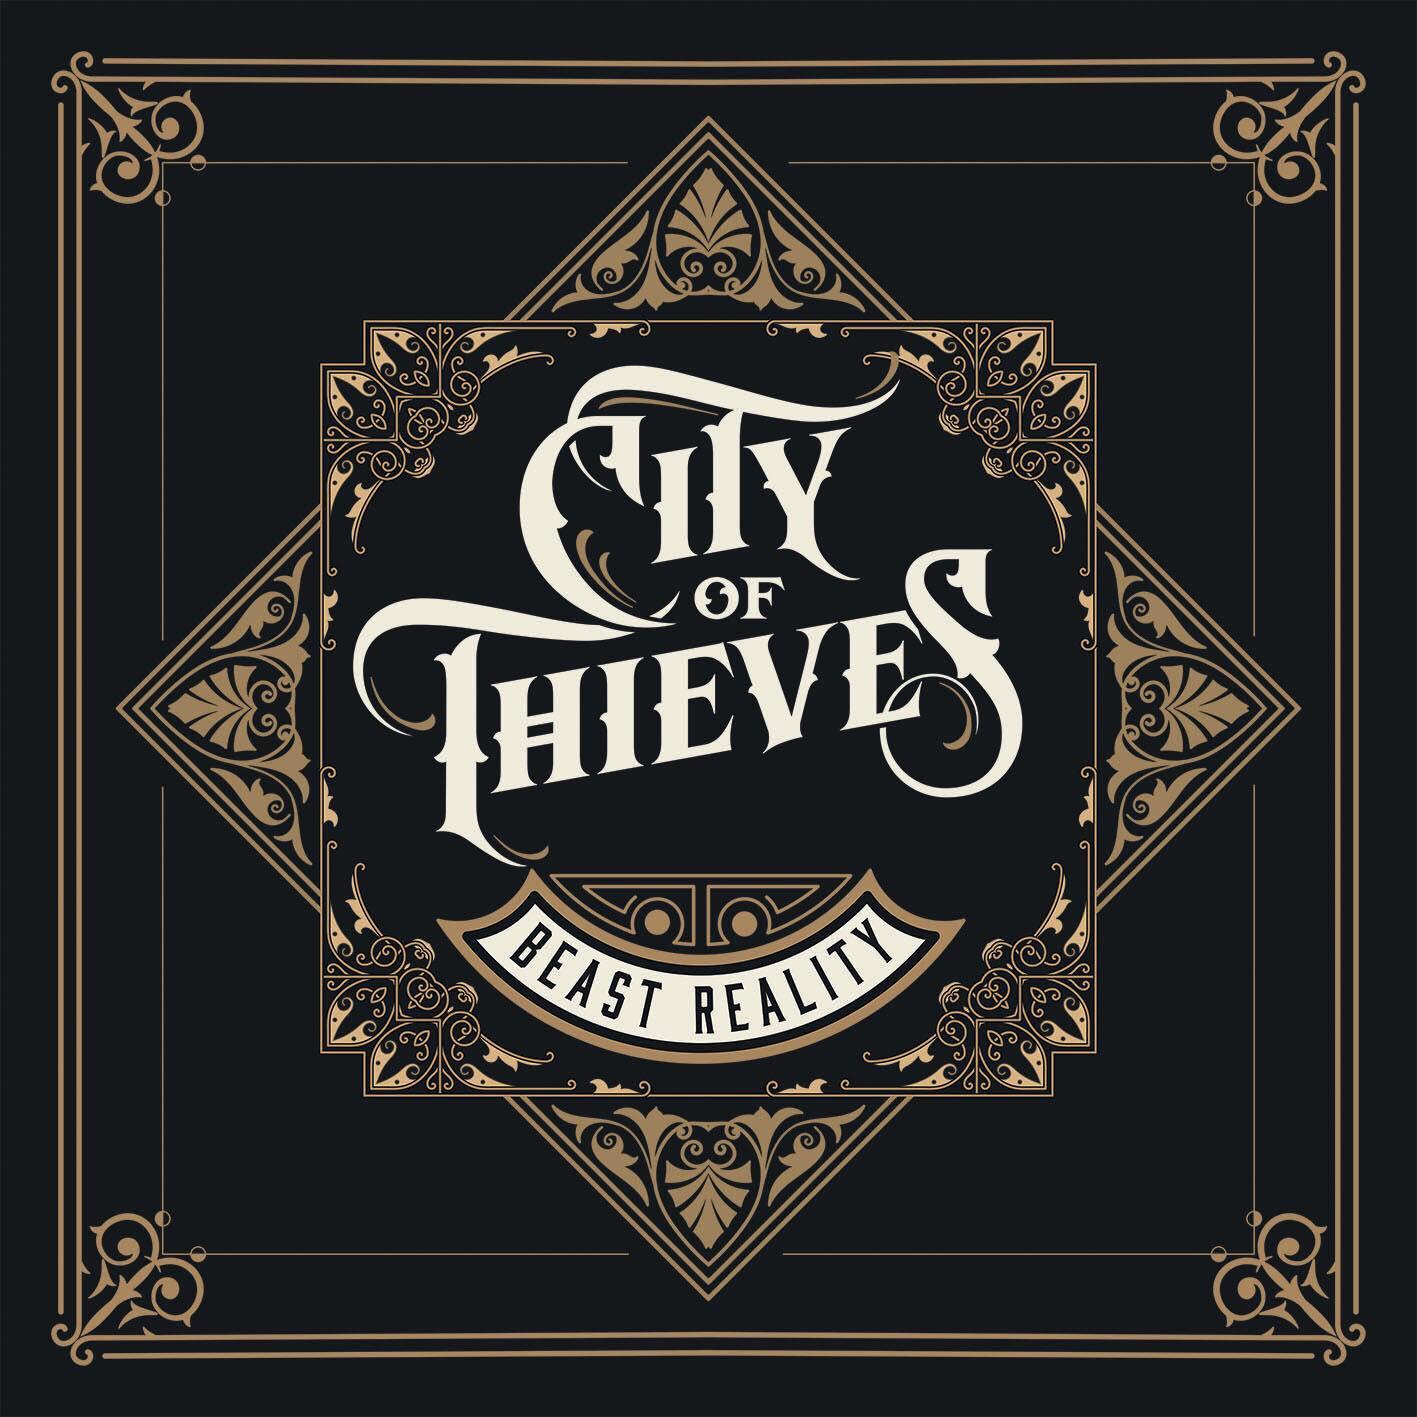 city of thieves - Beast Reality.jpg